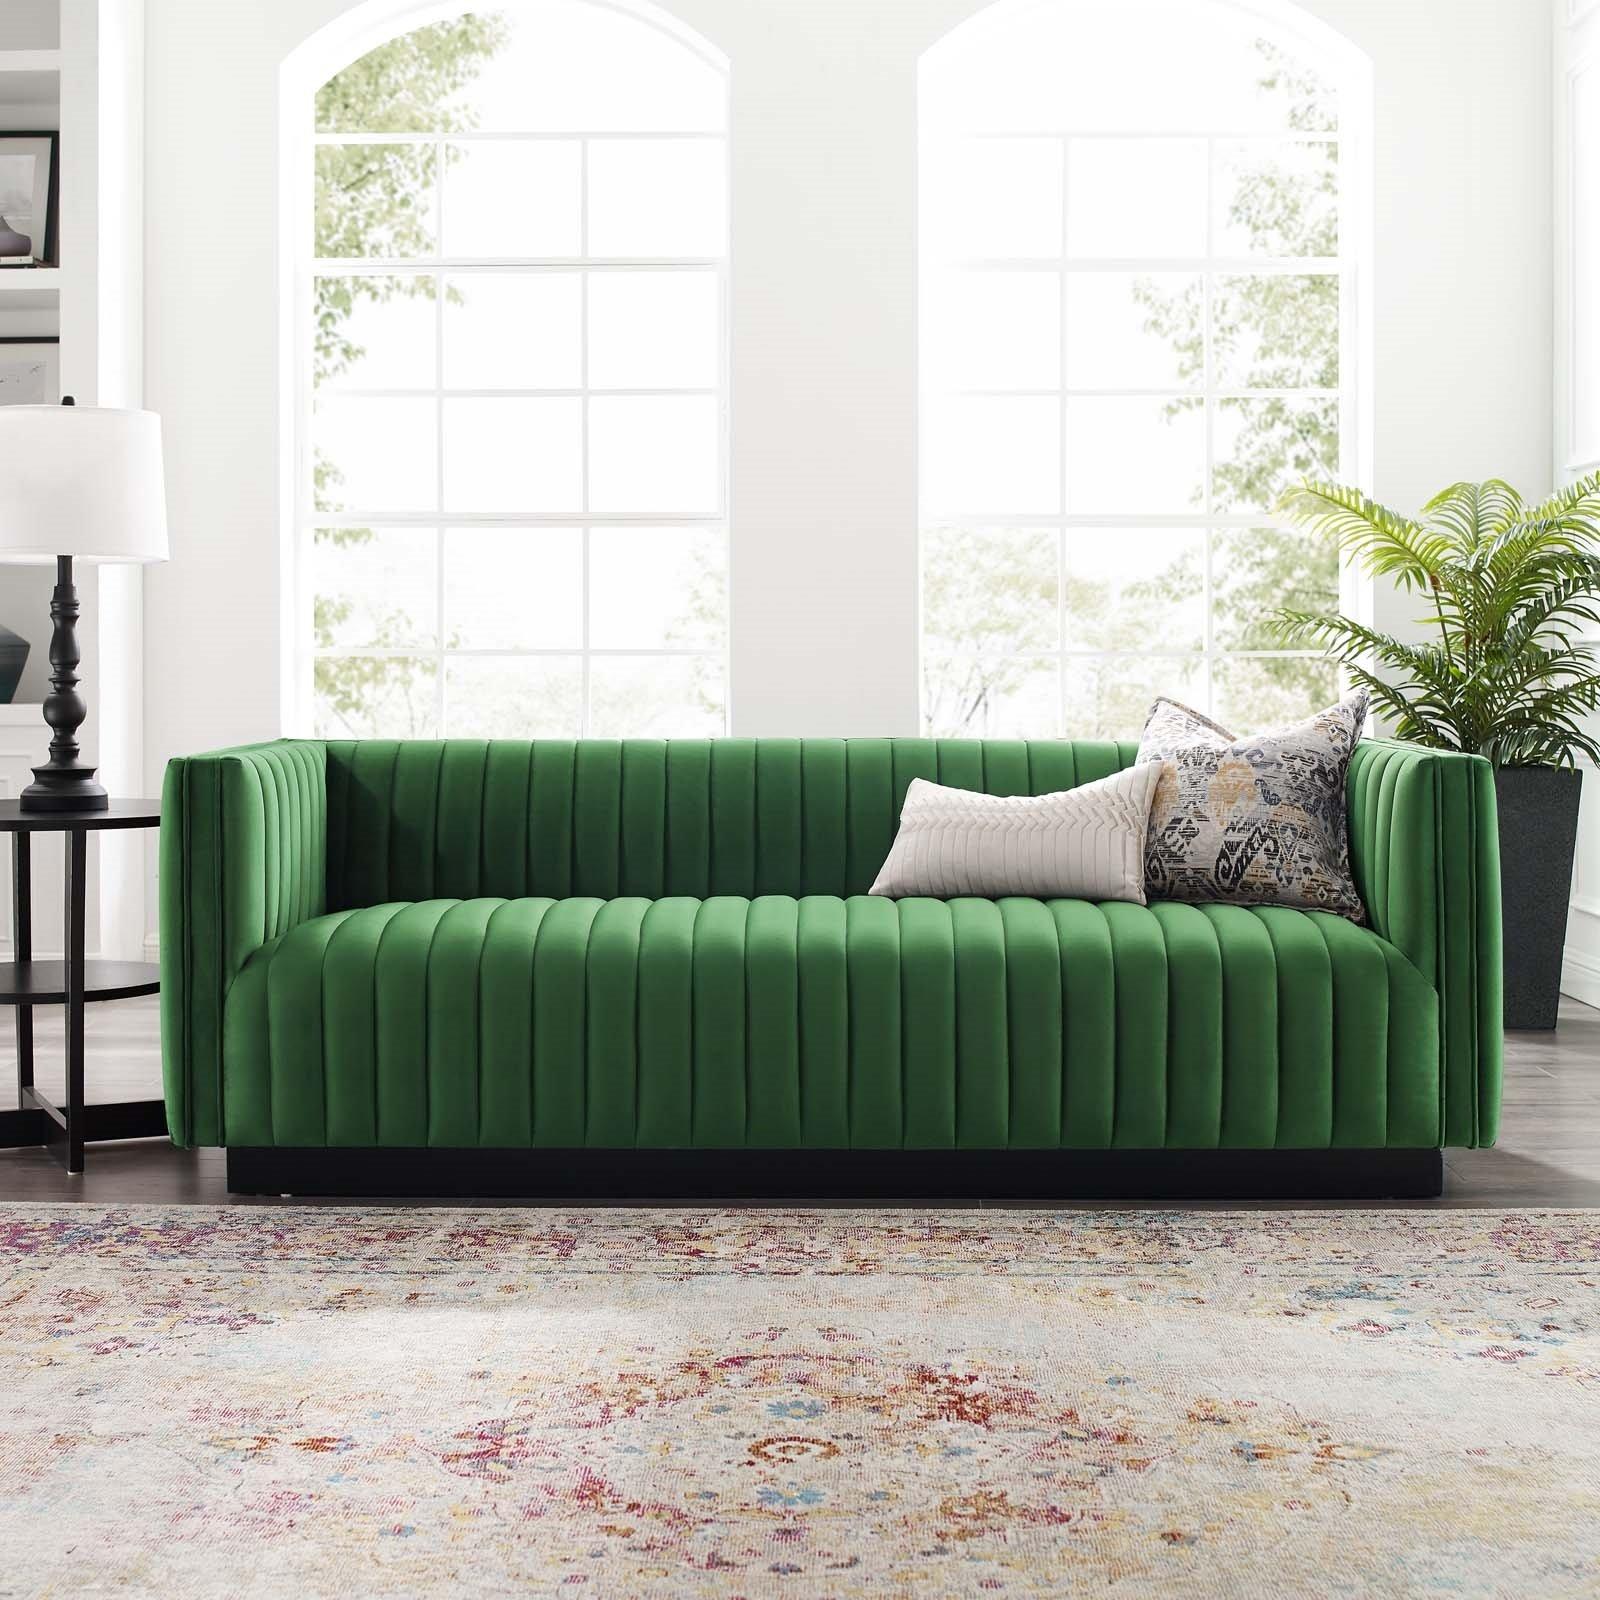 Conjure Channel Tufted Velvet Sofa in Emerald